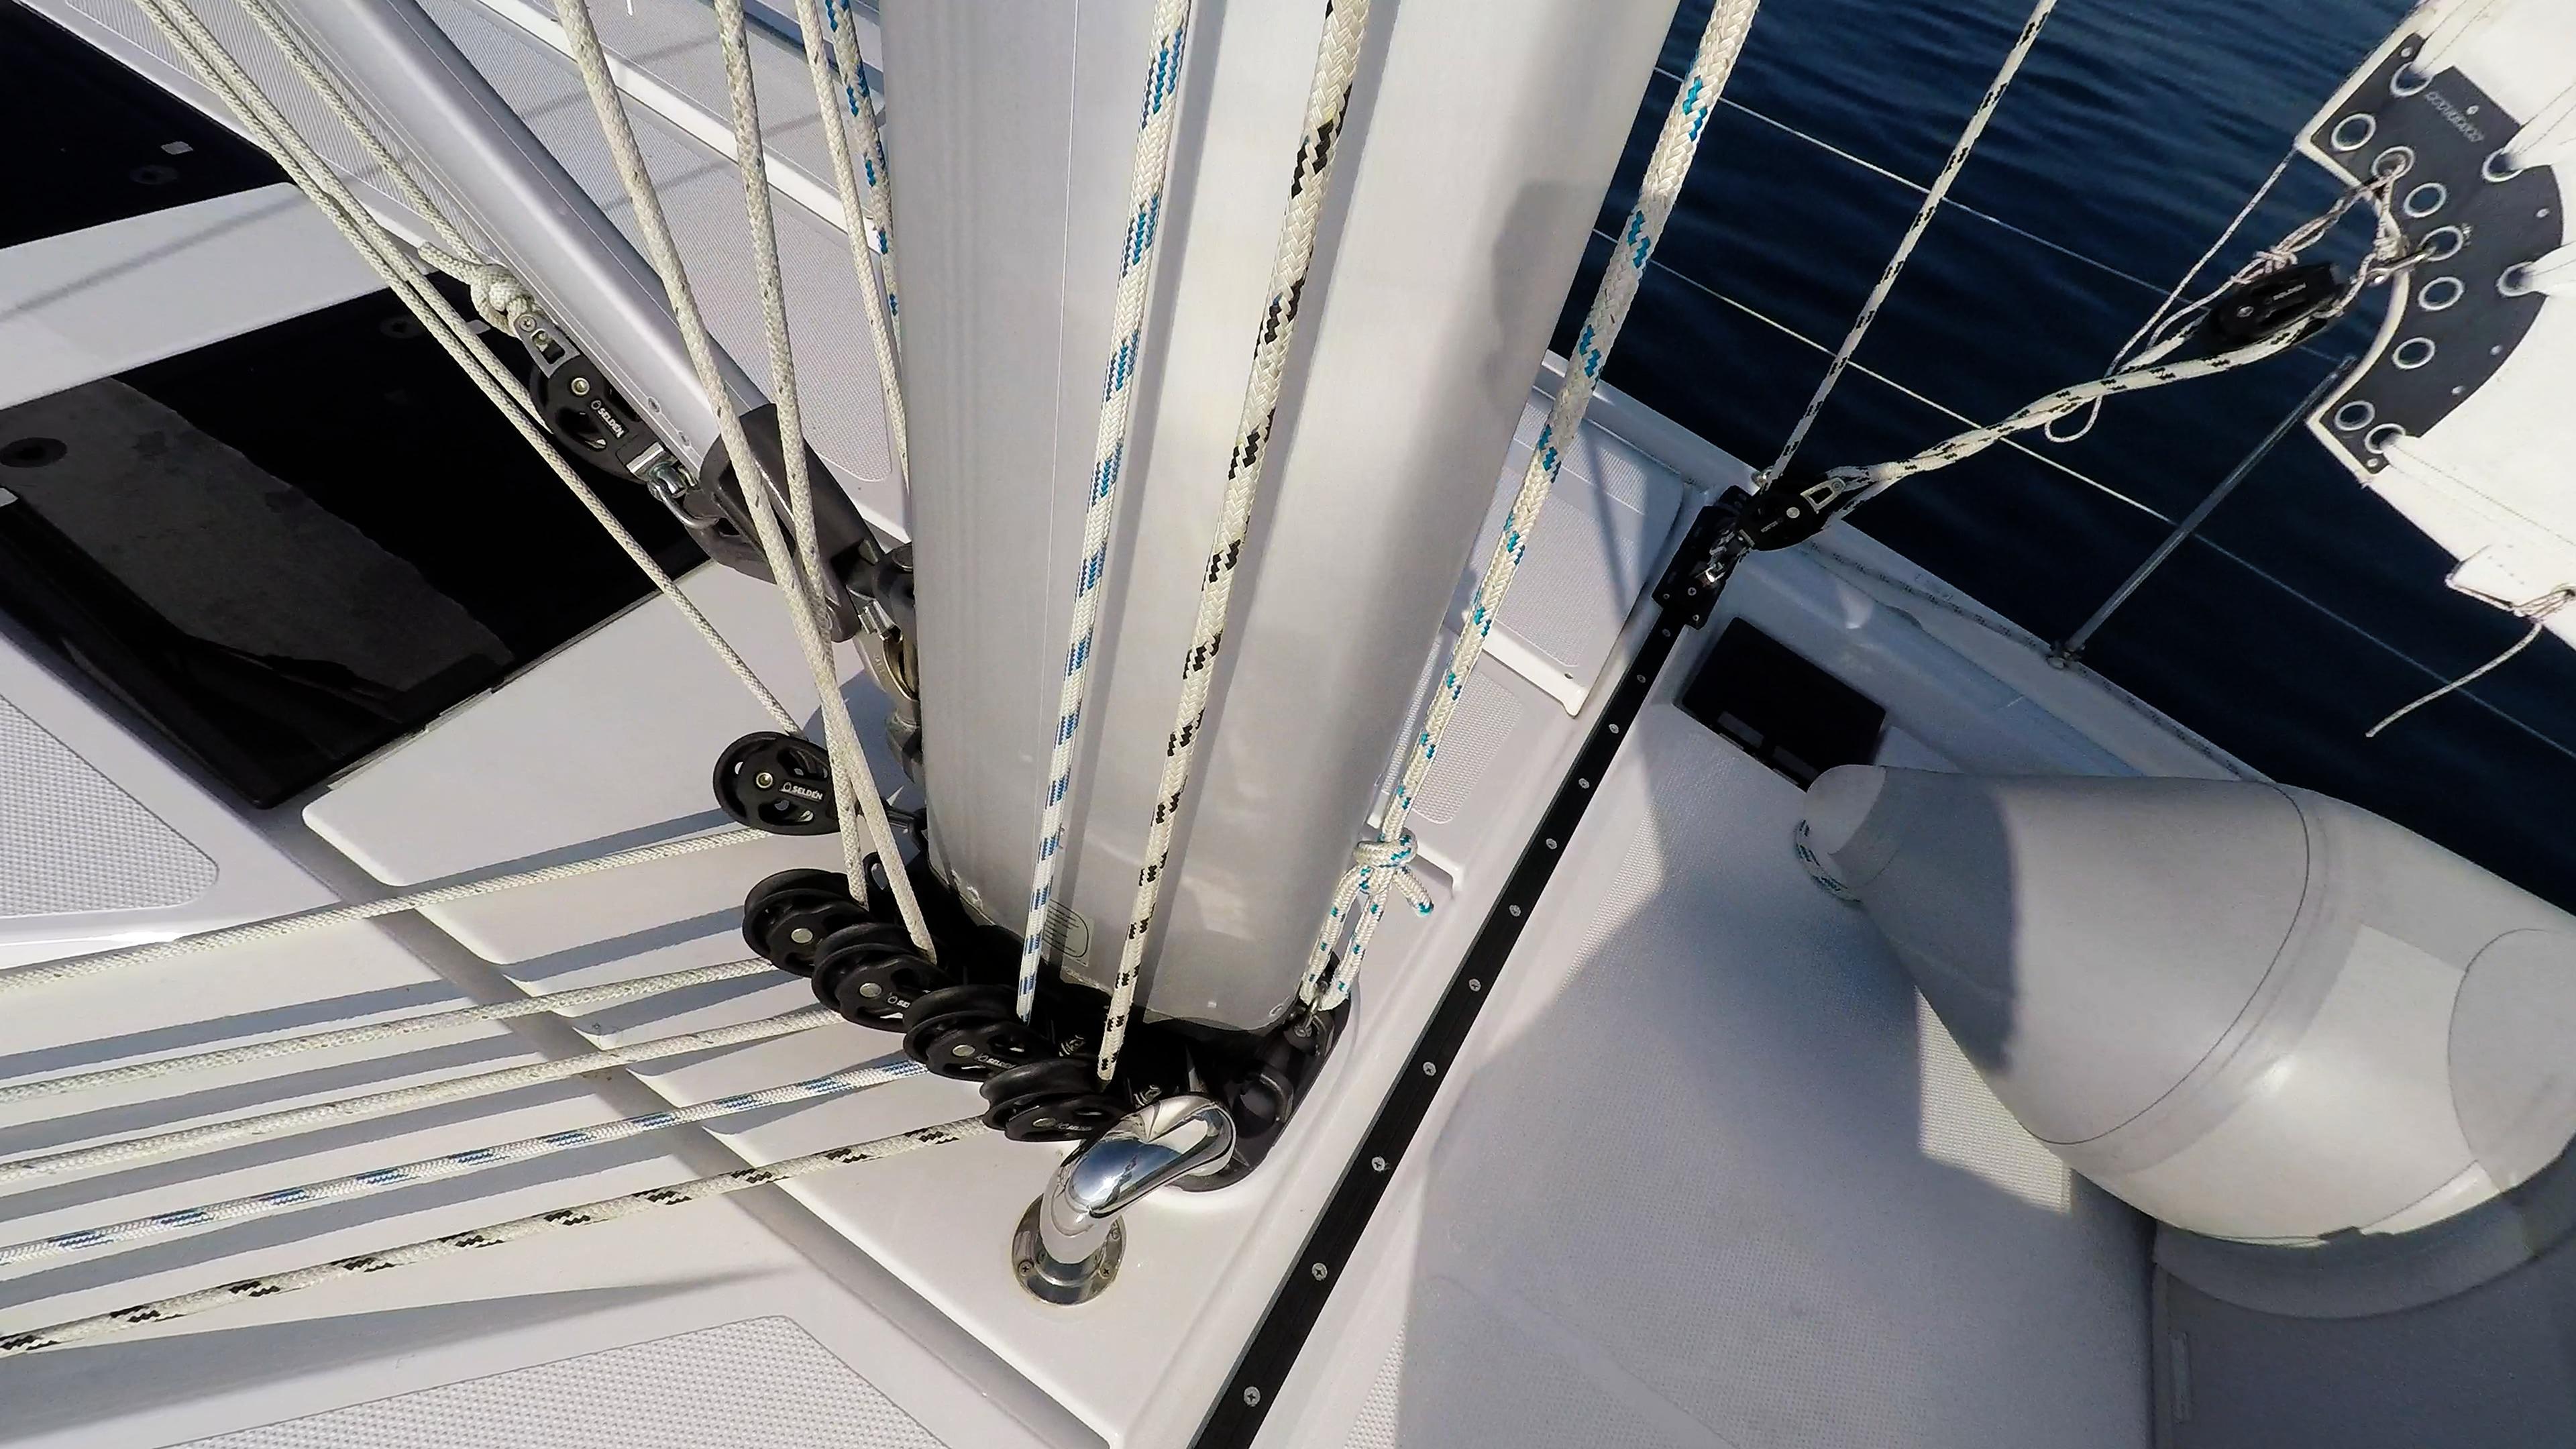 Segelyacht Deck Seile Linien Takelwerk Mast Segelboot Segeln Segel